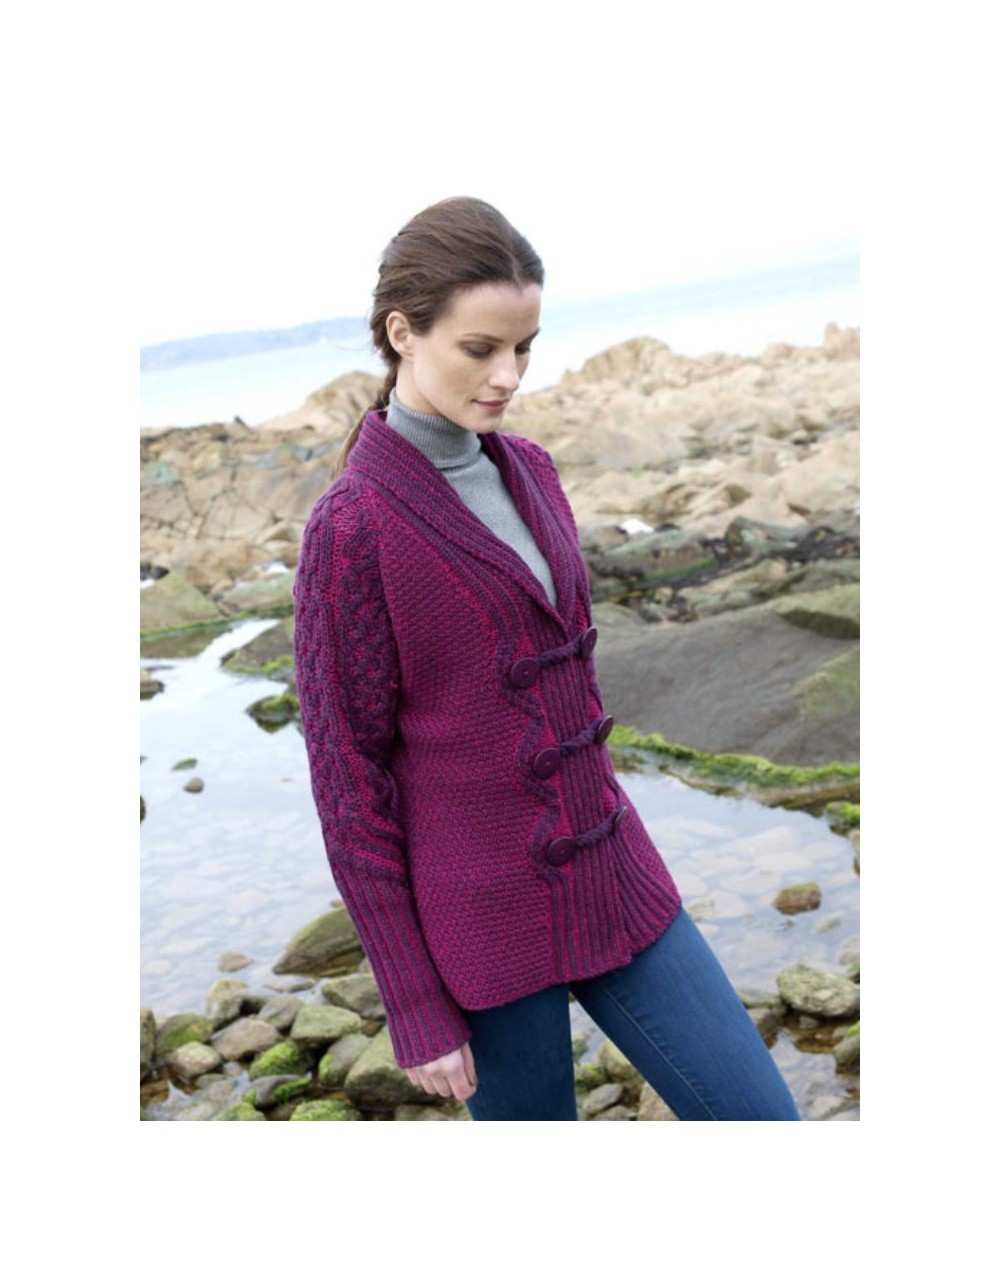 Aran Pattern Two Tone Cardigan|Aran Cardigans Women|Irish Handcrafts 1